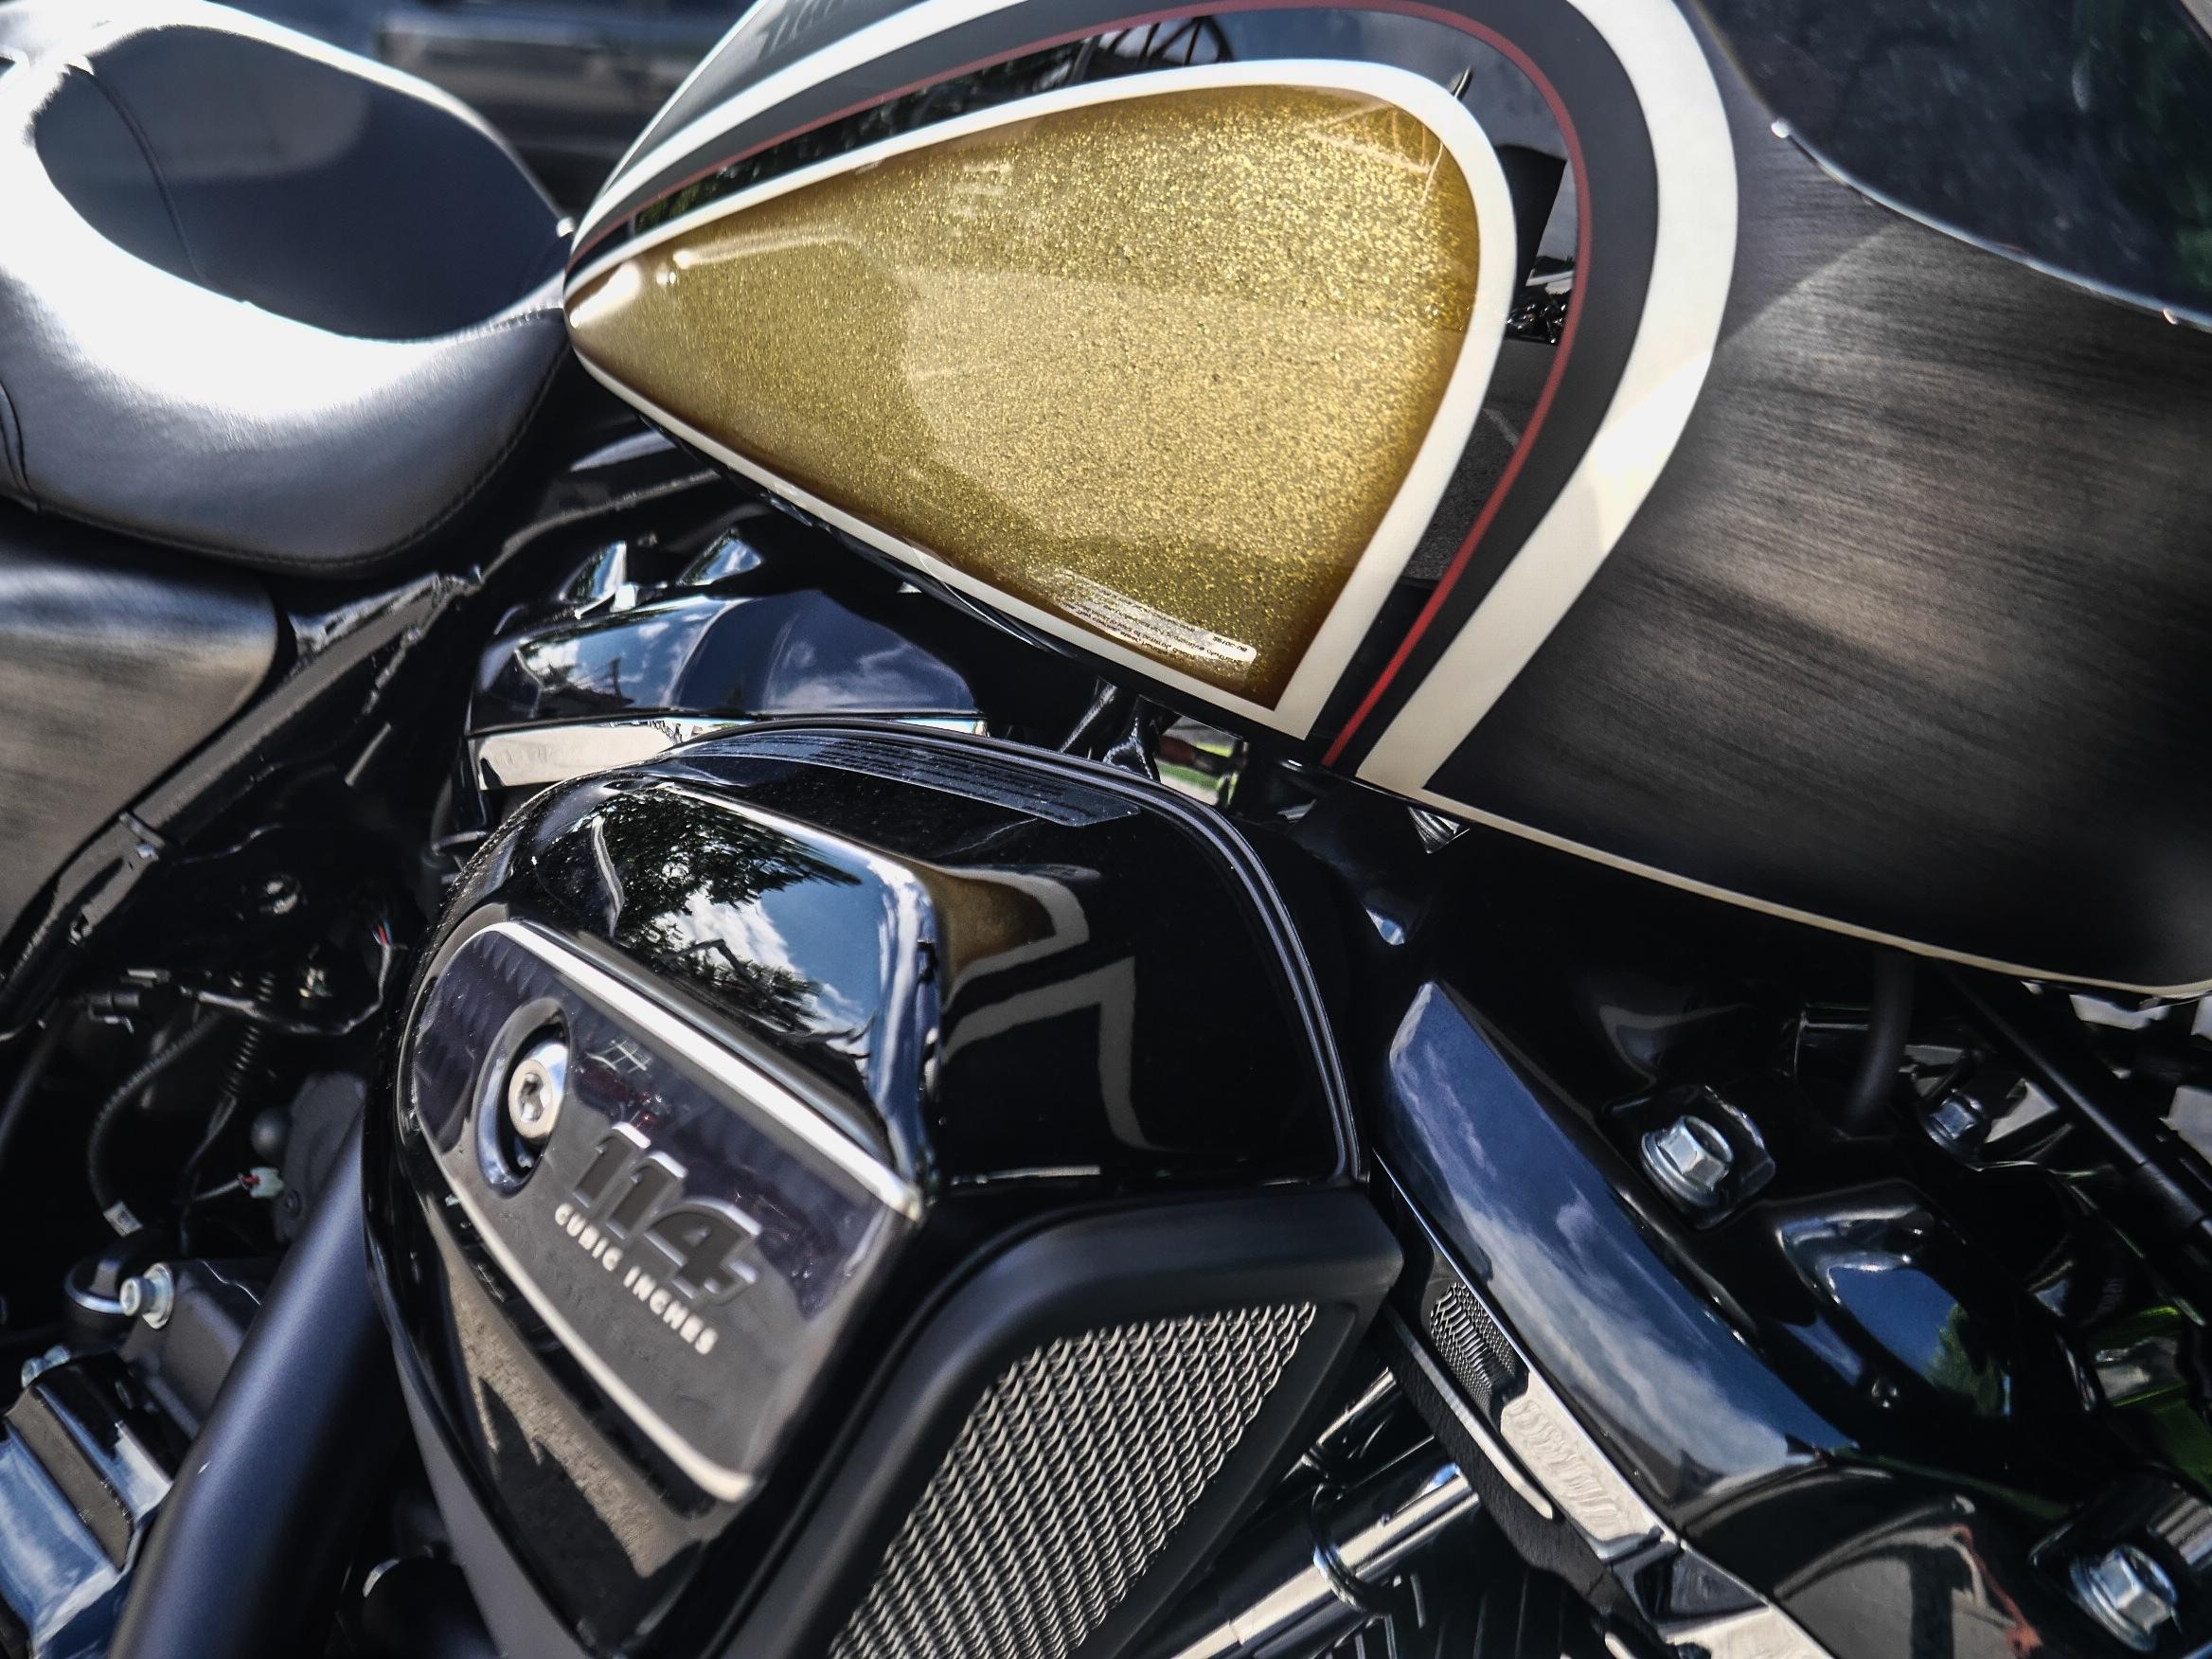 New 2019 Harley-Davidson Road Glide Special